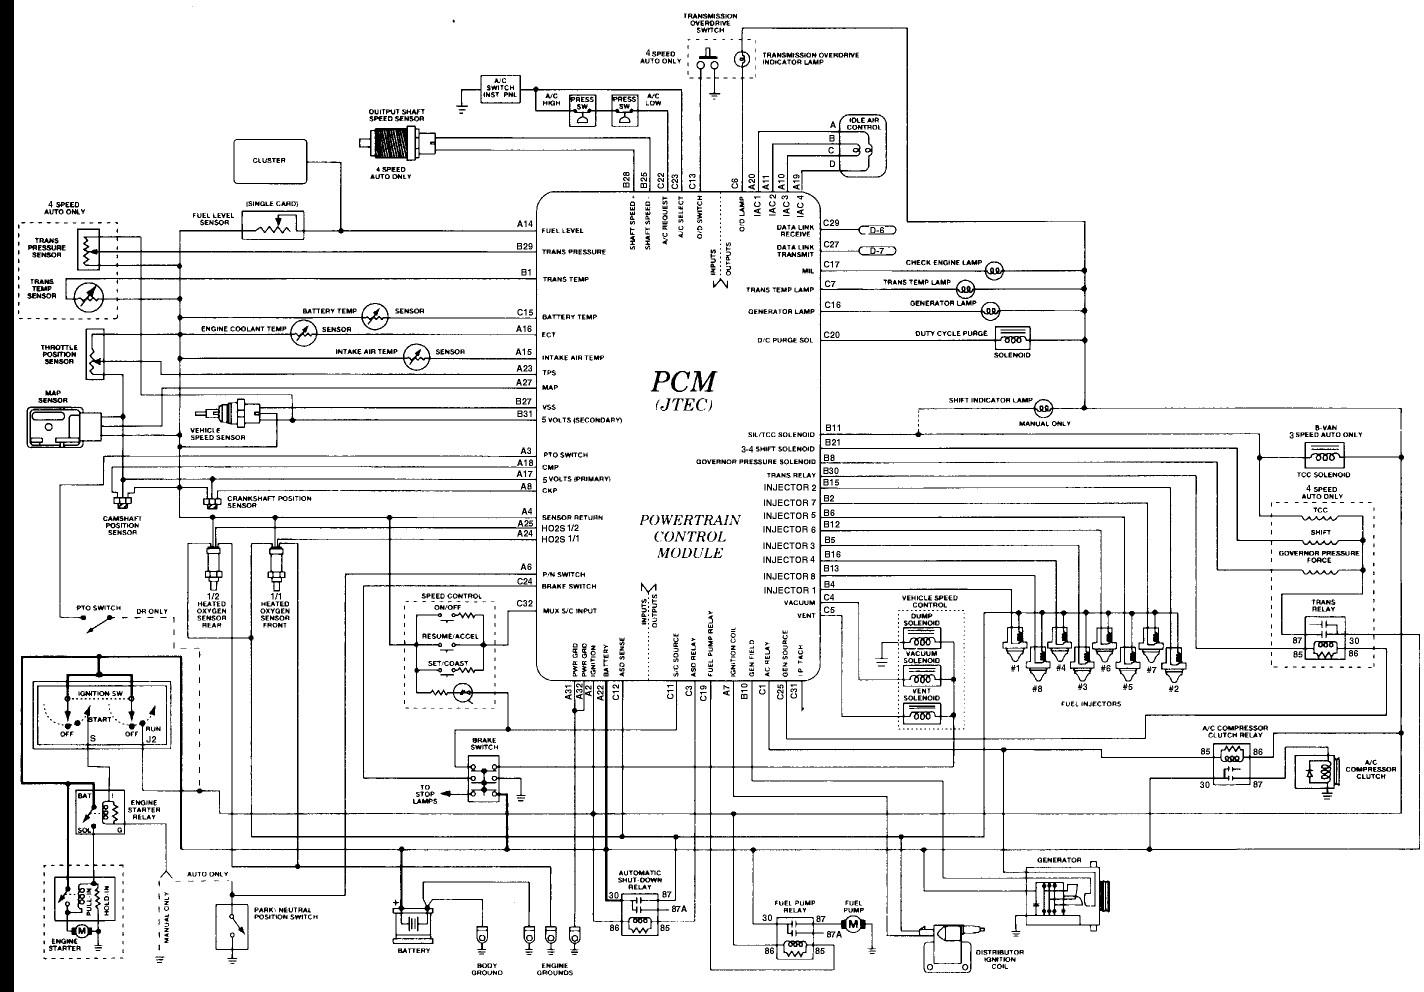 dodge ram 1500 wiring diagram Download-1999 Dodge Durango Radio Wiring Diagram New 18-o